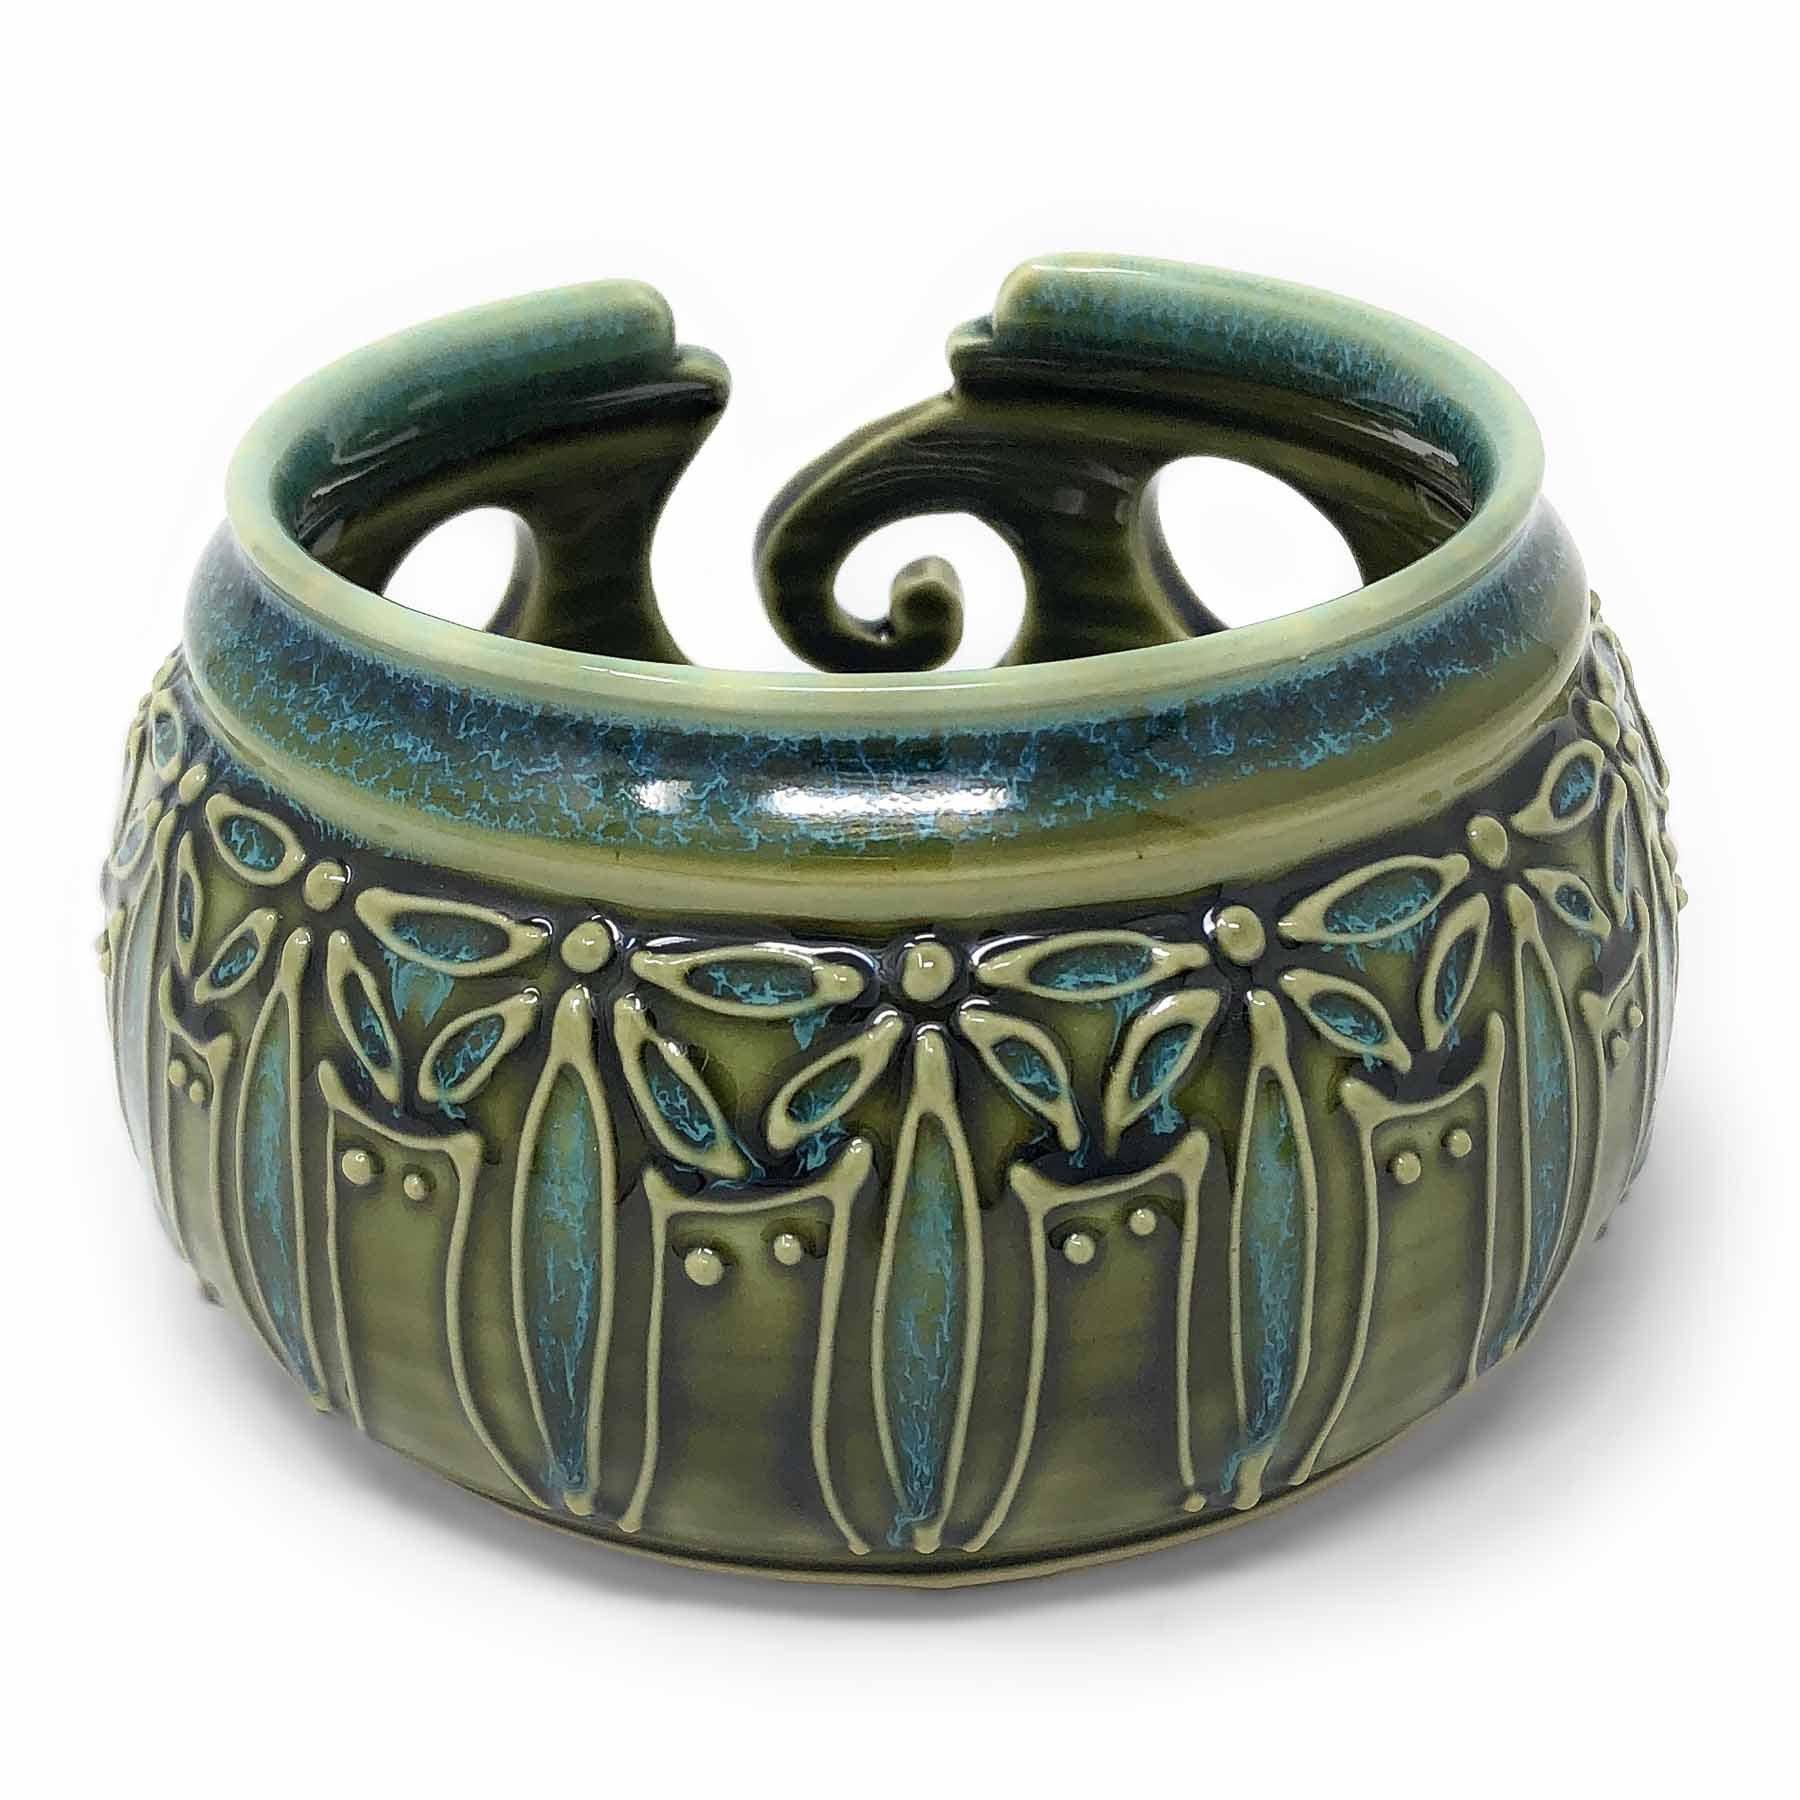 AshenWren Ceramics Yarn Bowl with Floral Slip Trailing, Emerald Green